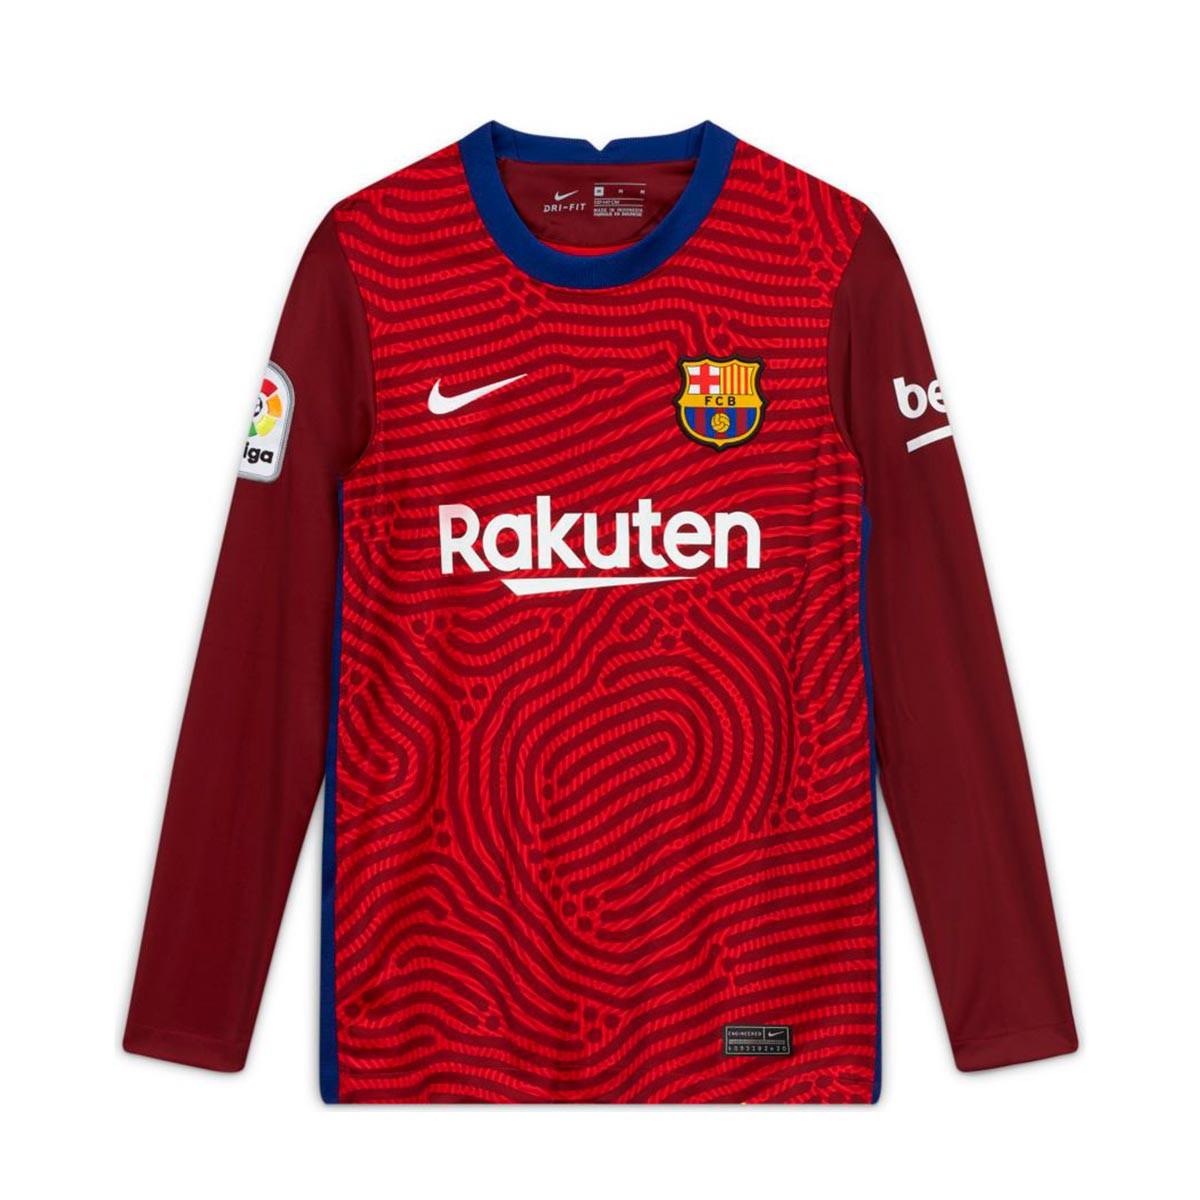 jersey nike fc barcelona stadium segunda equipacion portero 2020 2021 nino university red team red white football store futbol emotion nike fc barcelona stadium segunda equipacion portero 2020 2021 nino jersey